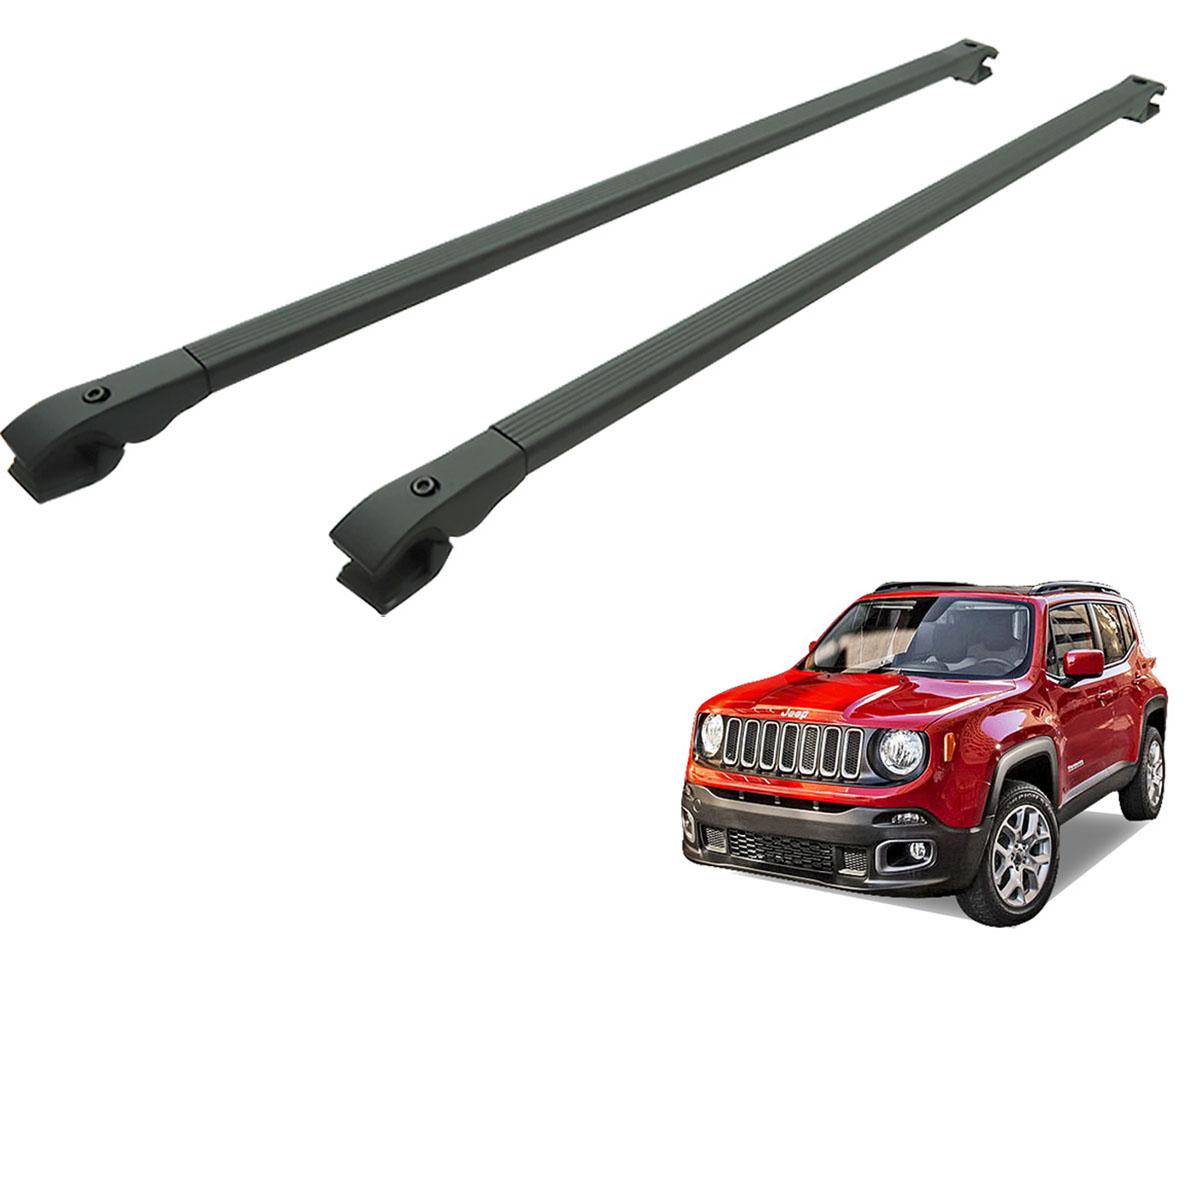 Travessa rack de teto alumínio preta Jeep Renegade 2016 2017